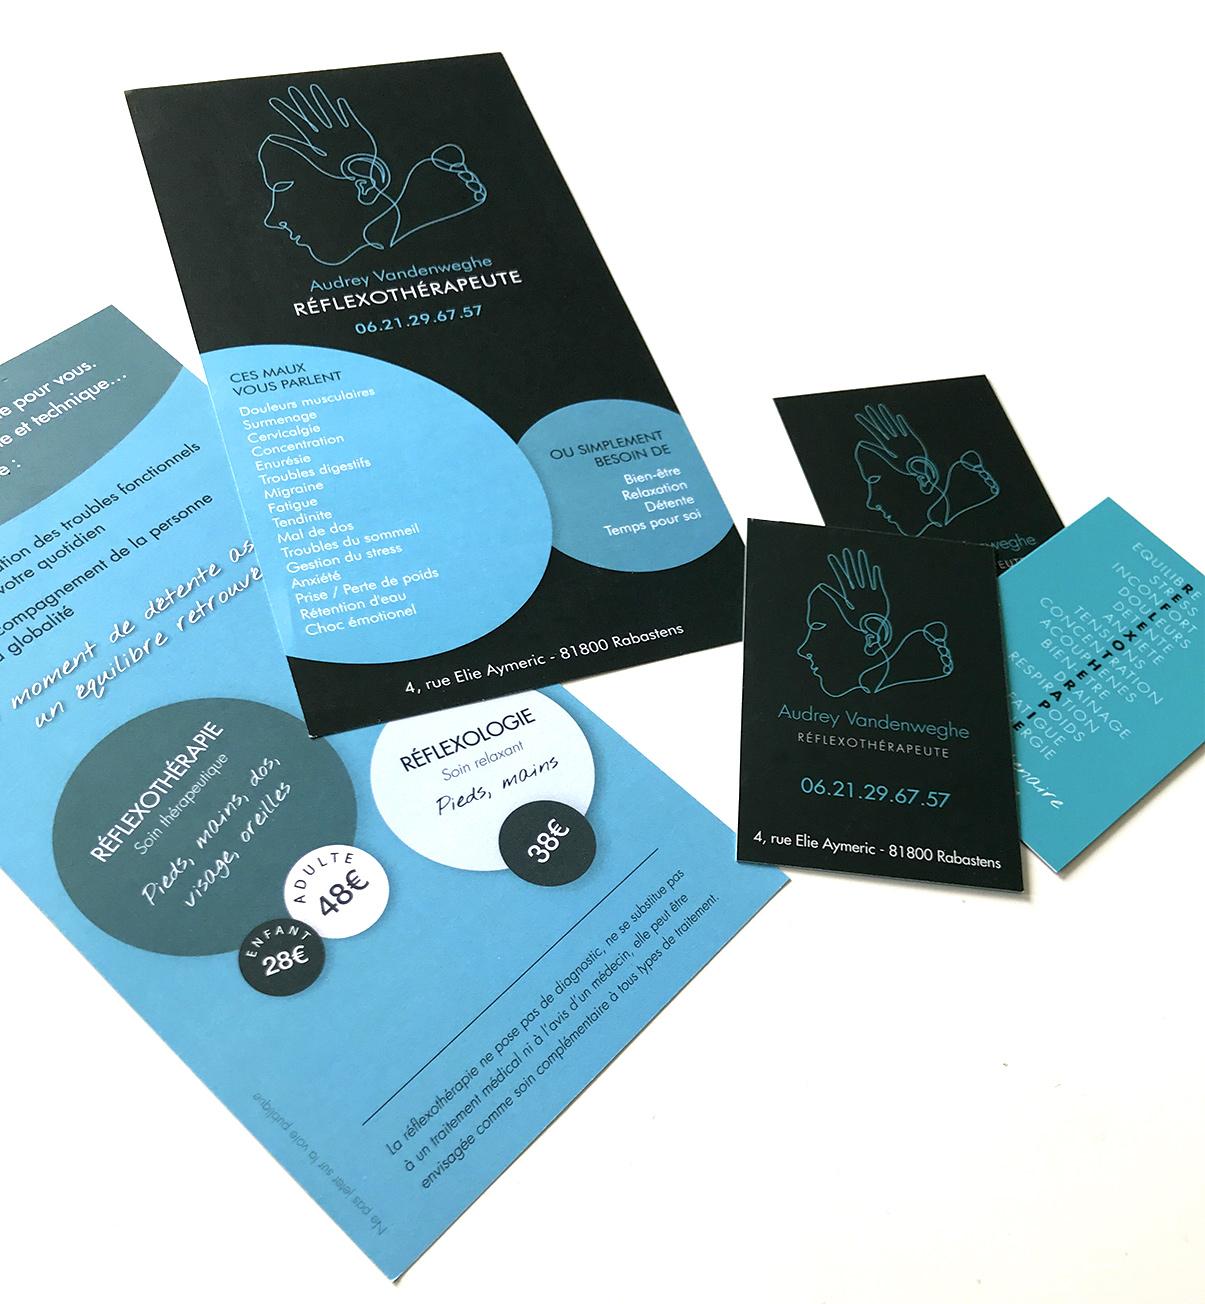 Cartes de visite- Flyer - Audrey Vandenweghe - Reflexothérapeute - Rabastens © www.ovarma.com